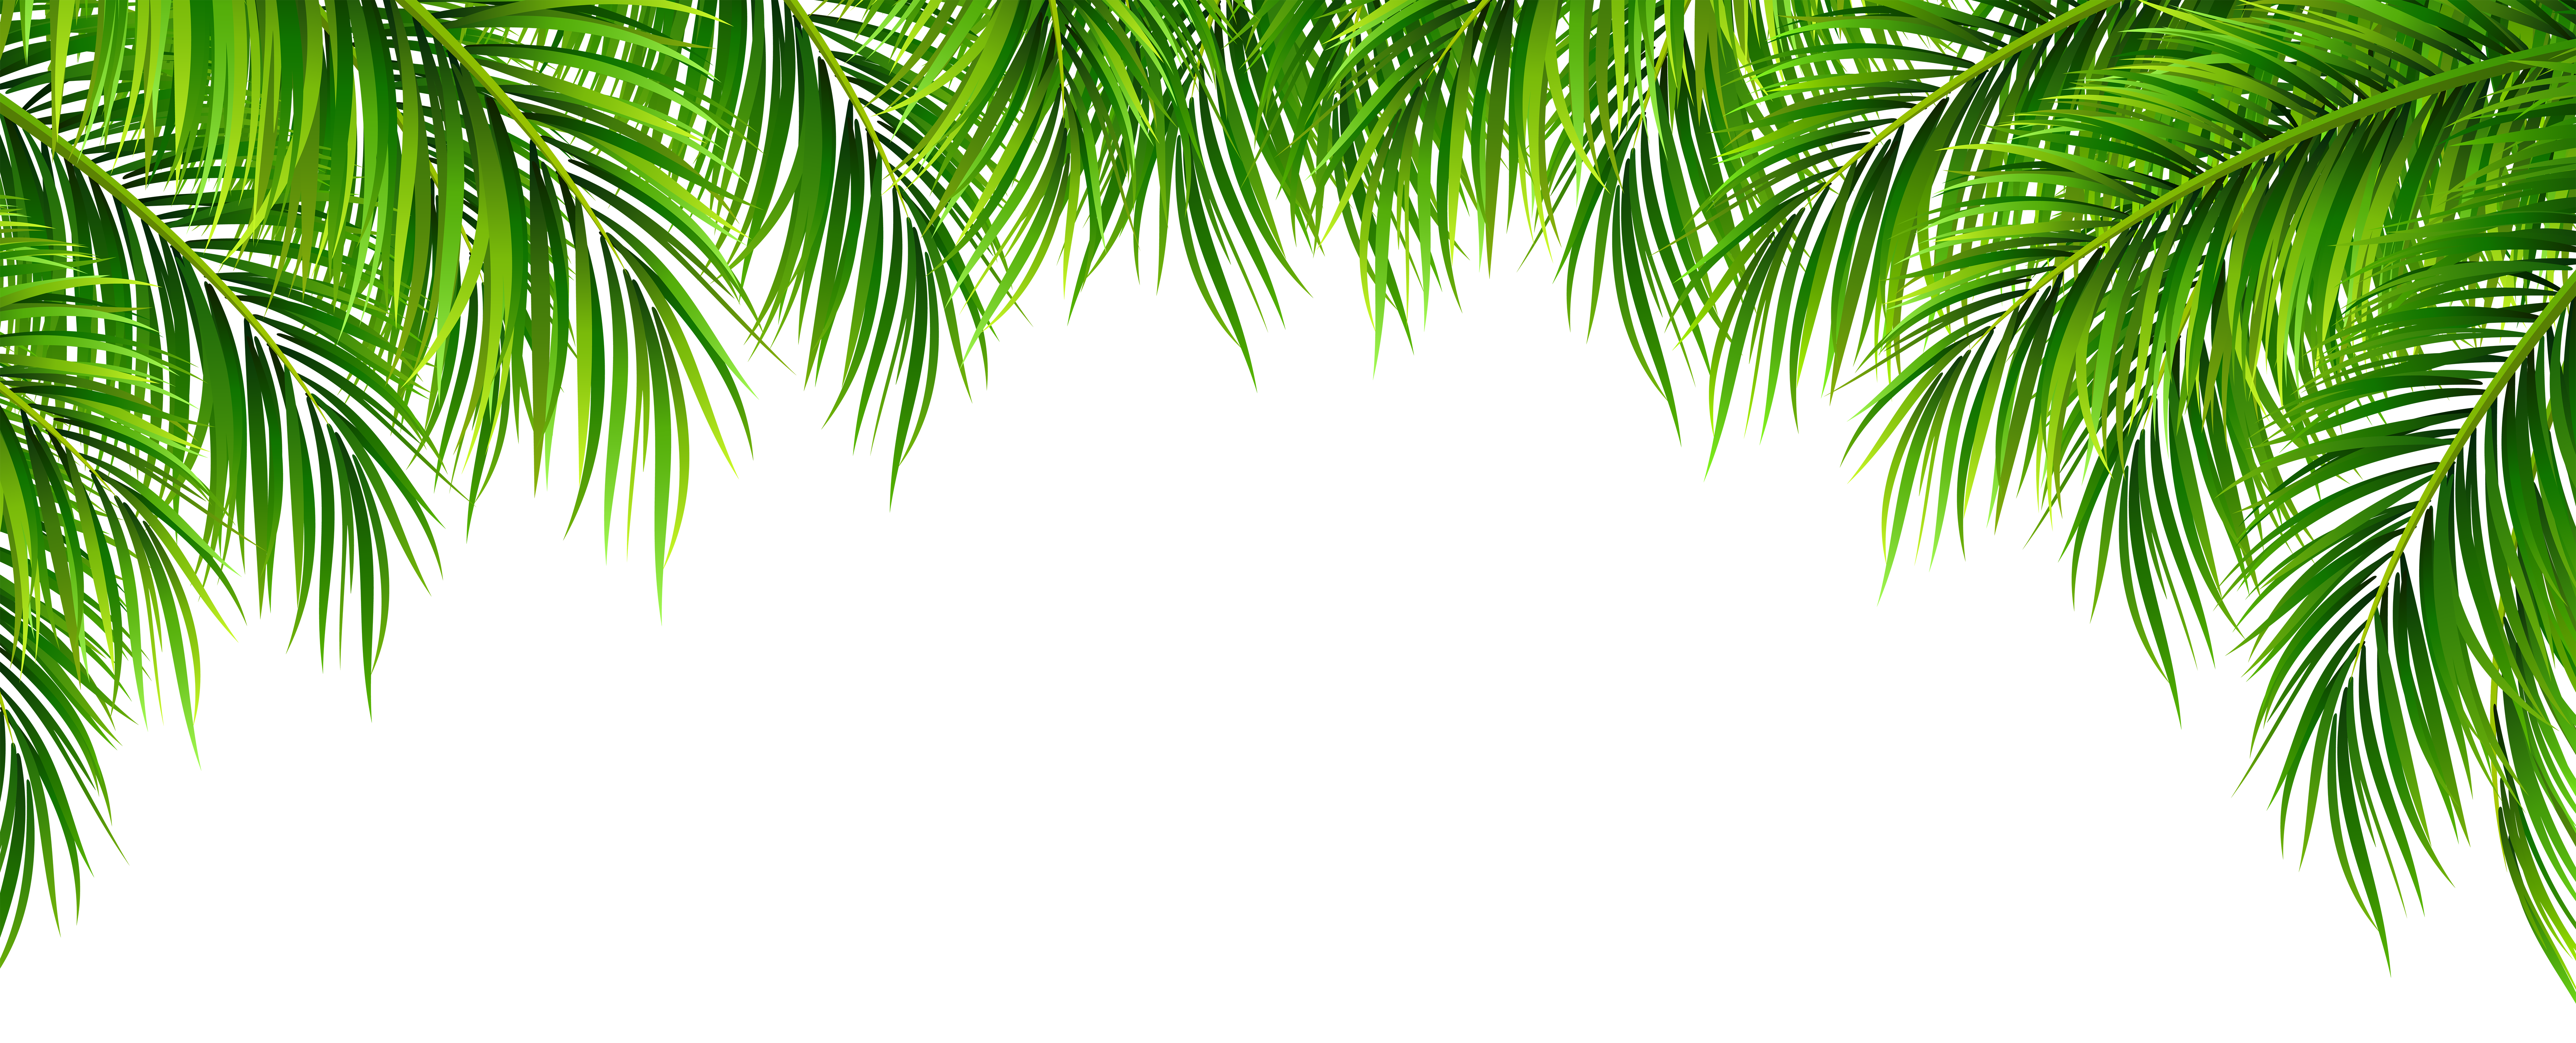 Decor png clip art. Clipart leaves palm leaves